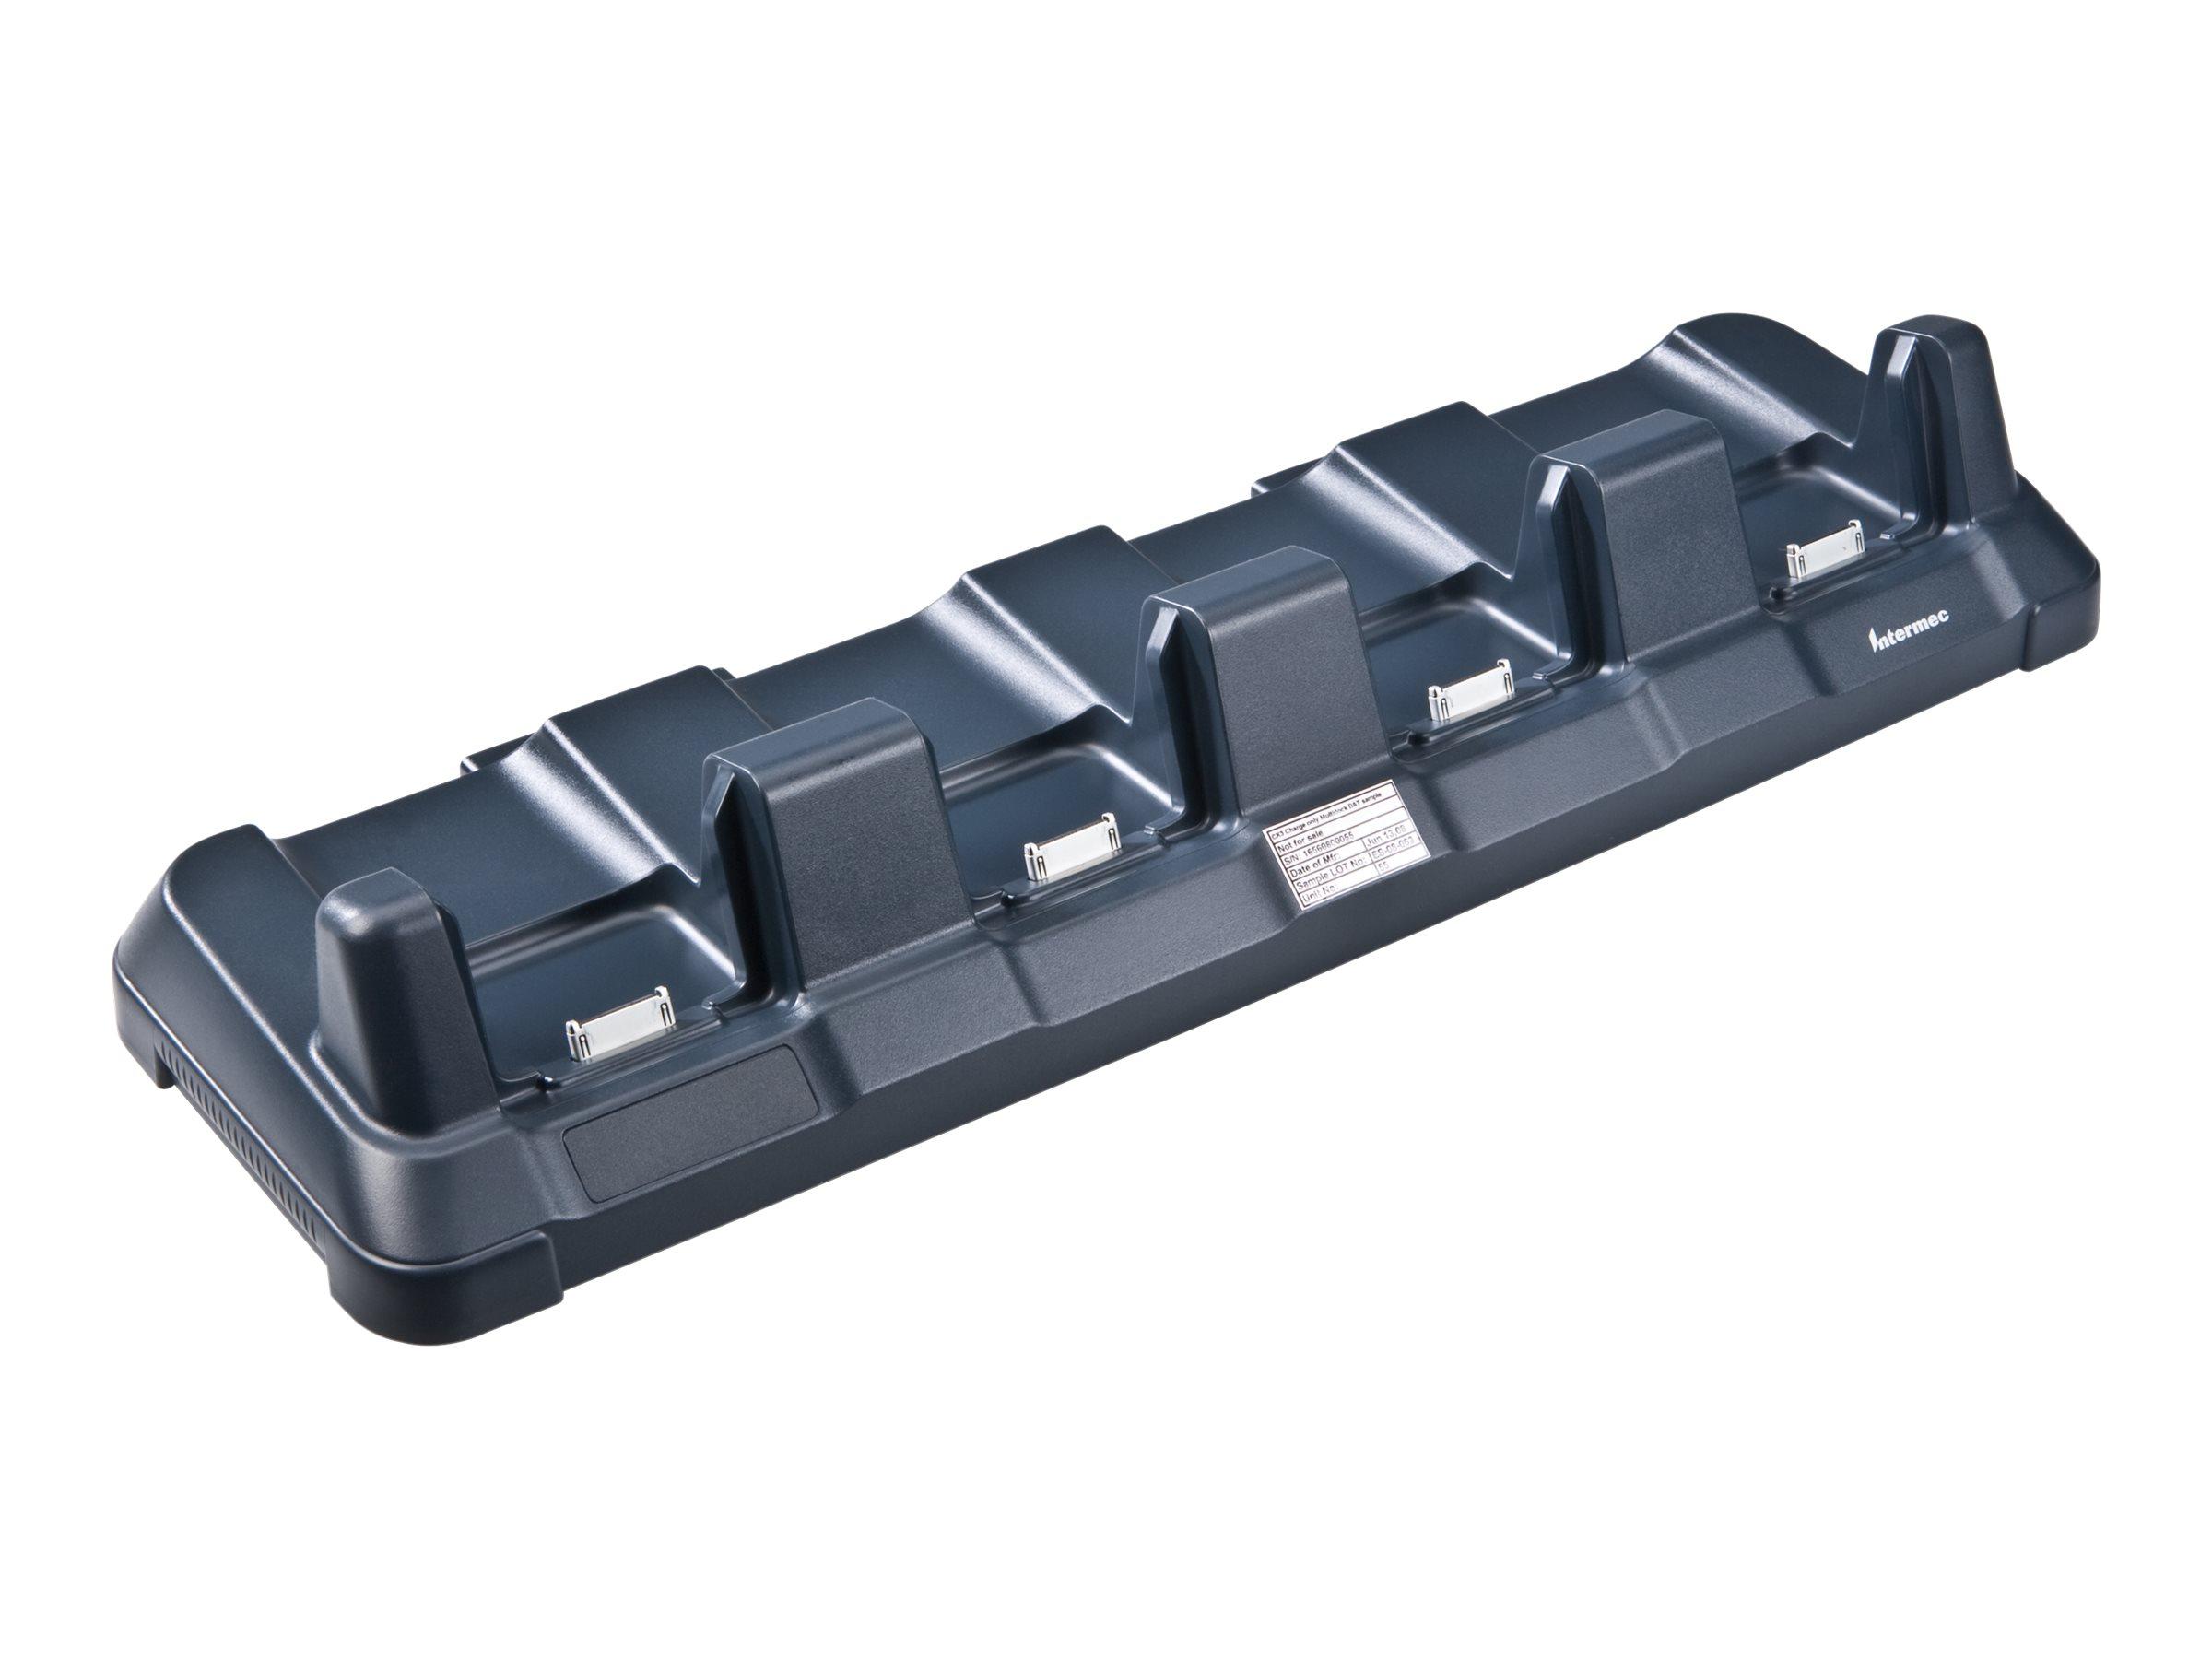 Intermec Multidock 4-slot - Docking Cradle (Anschlussstand) - Ethernet - für Dolphin CK65; Intermec CK3R, CK3X